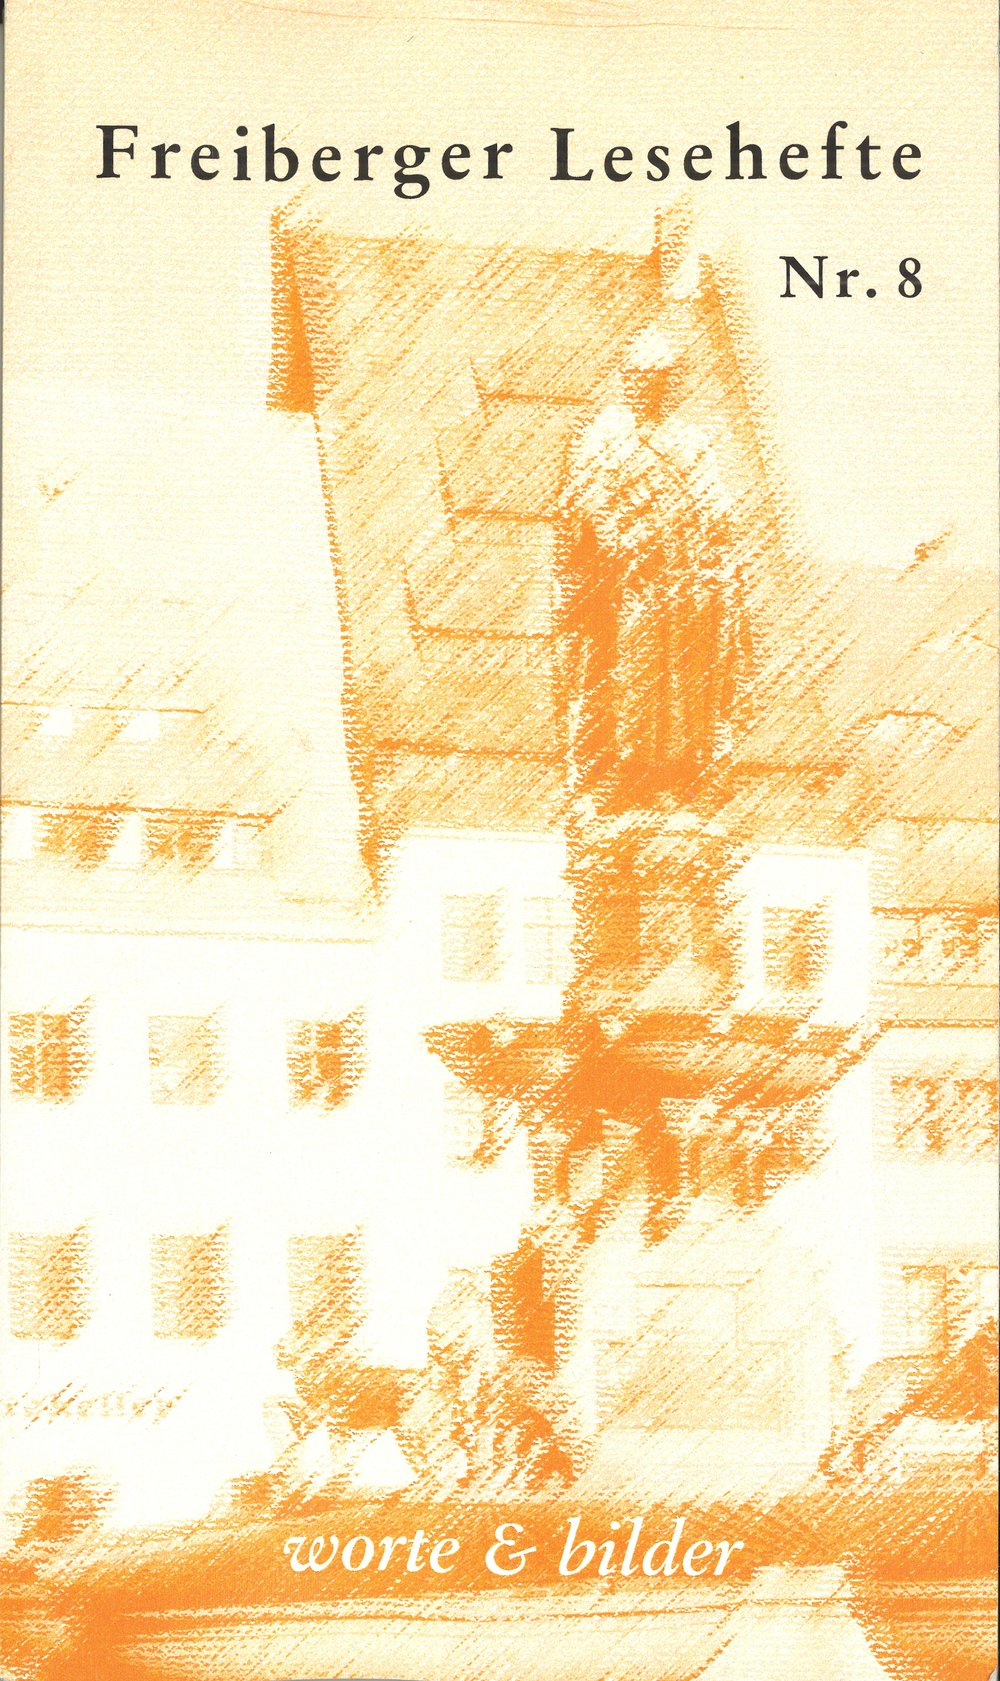 FREIBERGER LESEHEFTE_8_COVER_mini.jpg